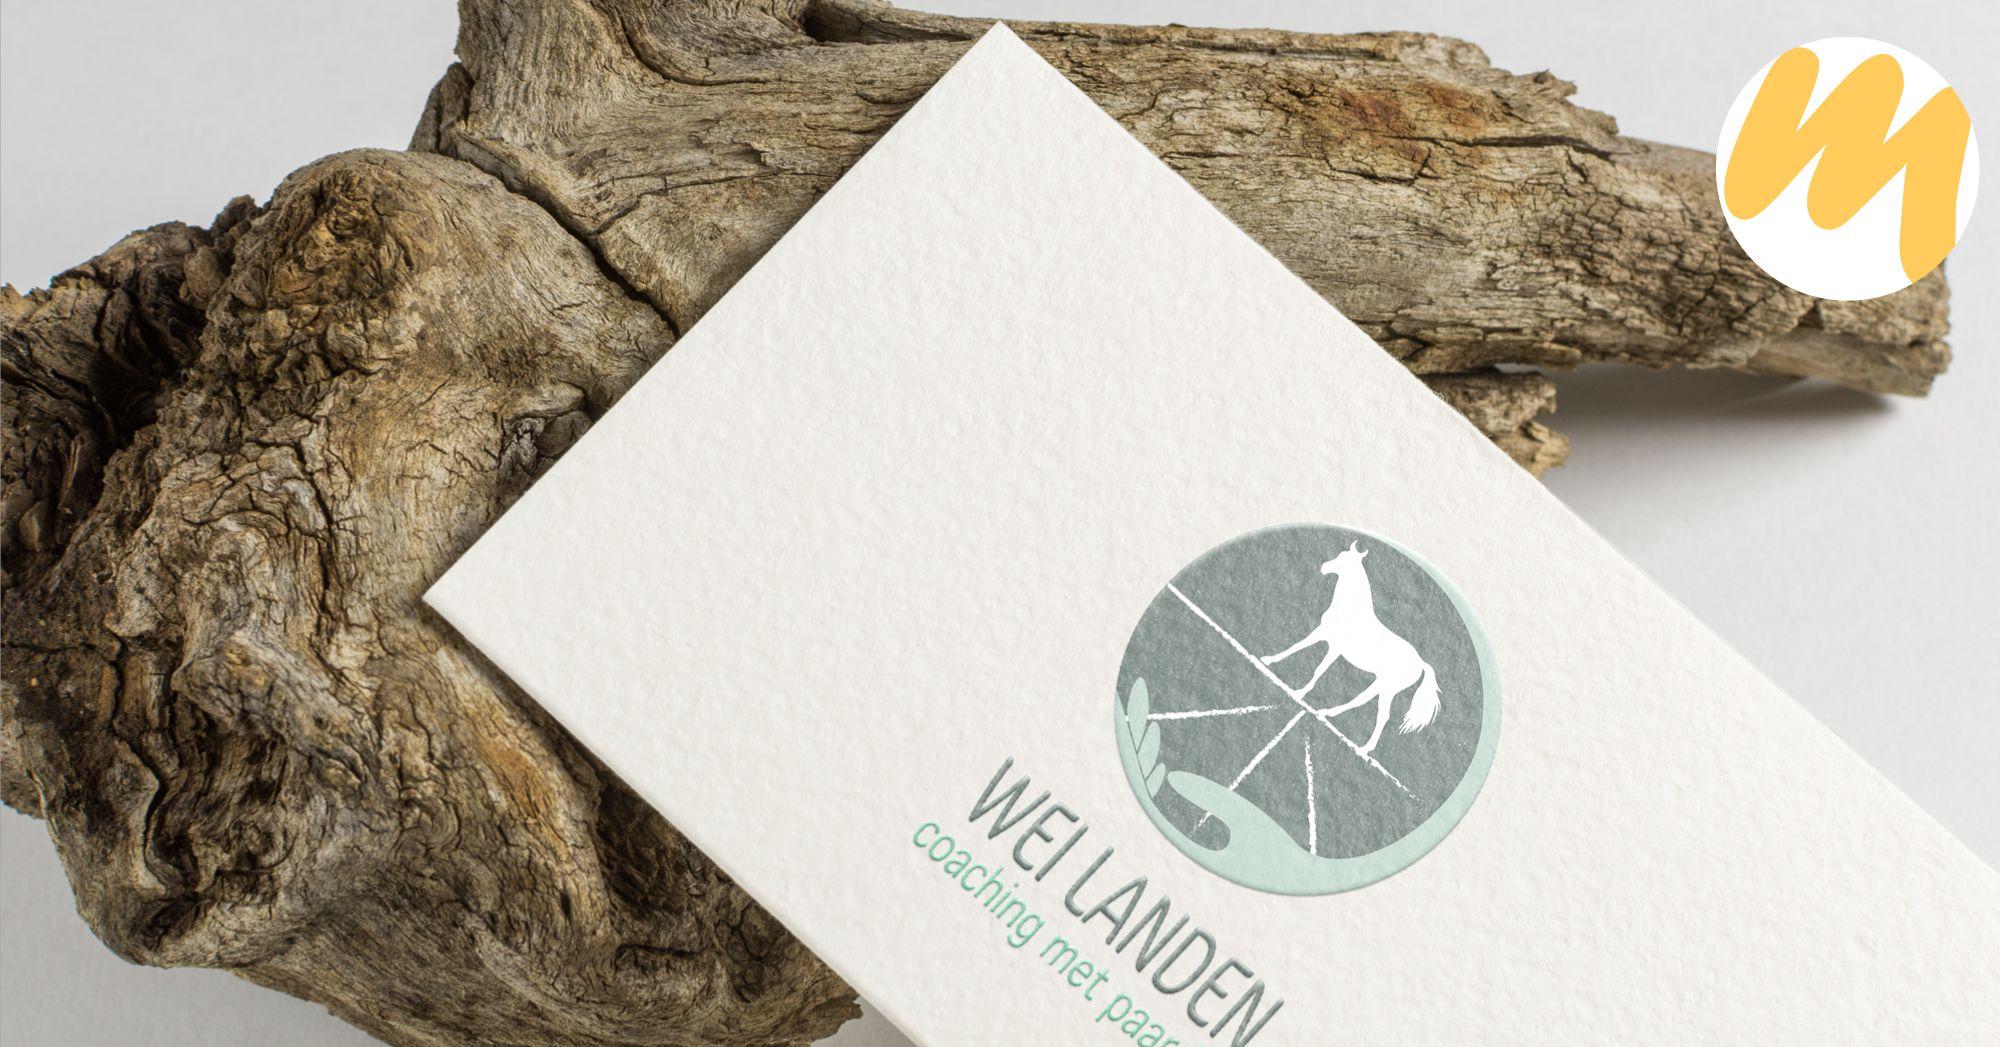 Wei Landen - Coaching met paarden, logo ontwerp, grafisch design, Esmy Media Design Betuwe, Gelderland, webdesign Tiel